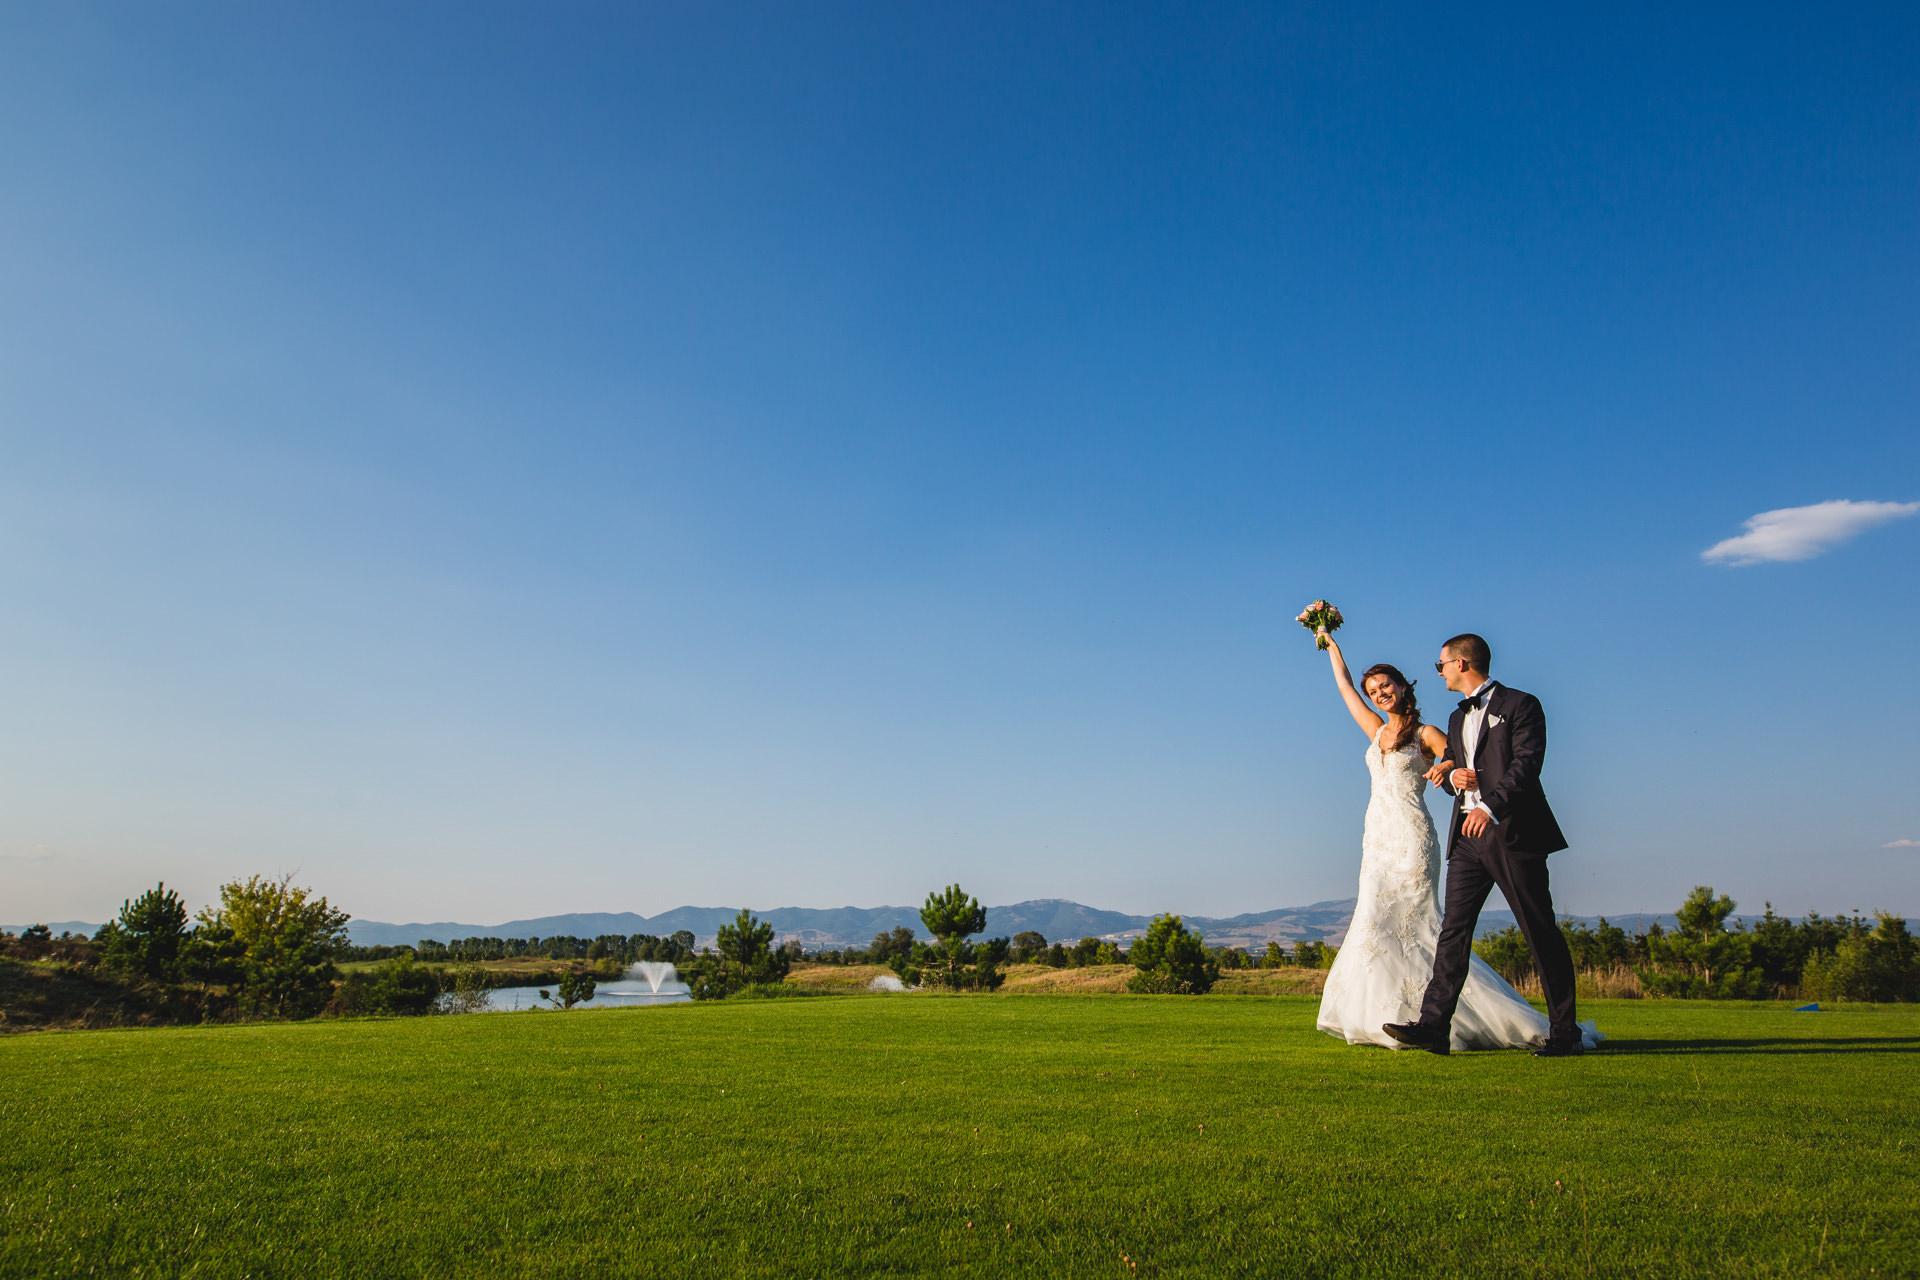 сватбена фотография равно поле